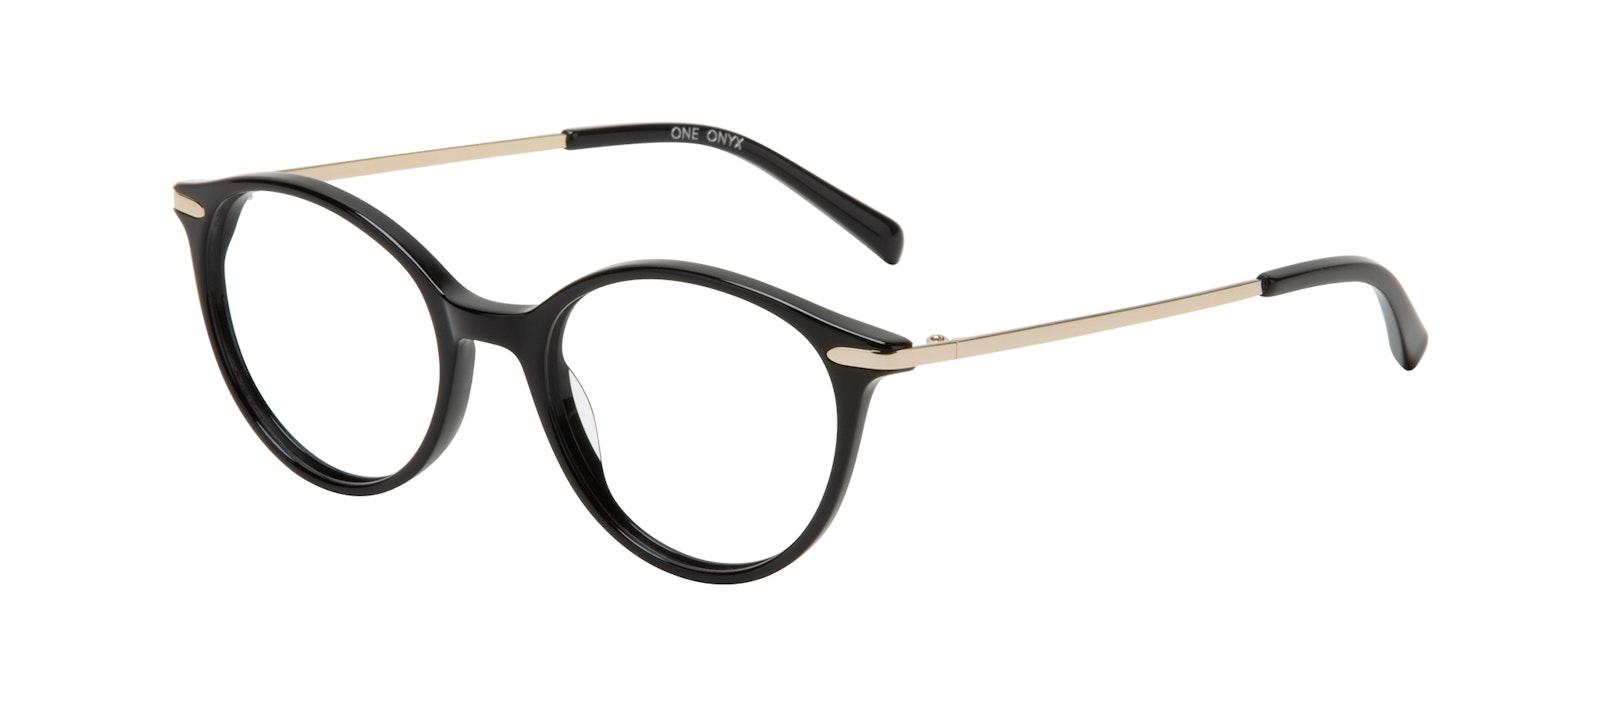 Affordable Fashion Glasses Round Eyeglasses Women One Onyx Tilt